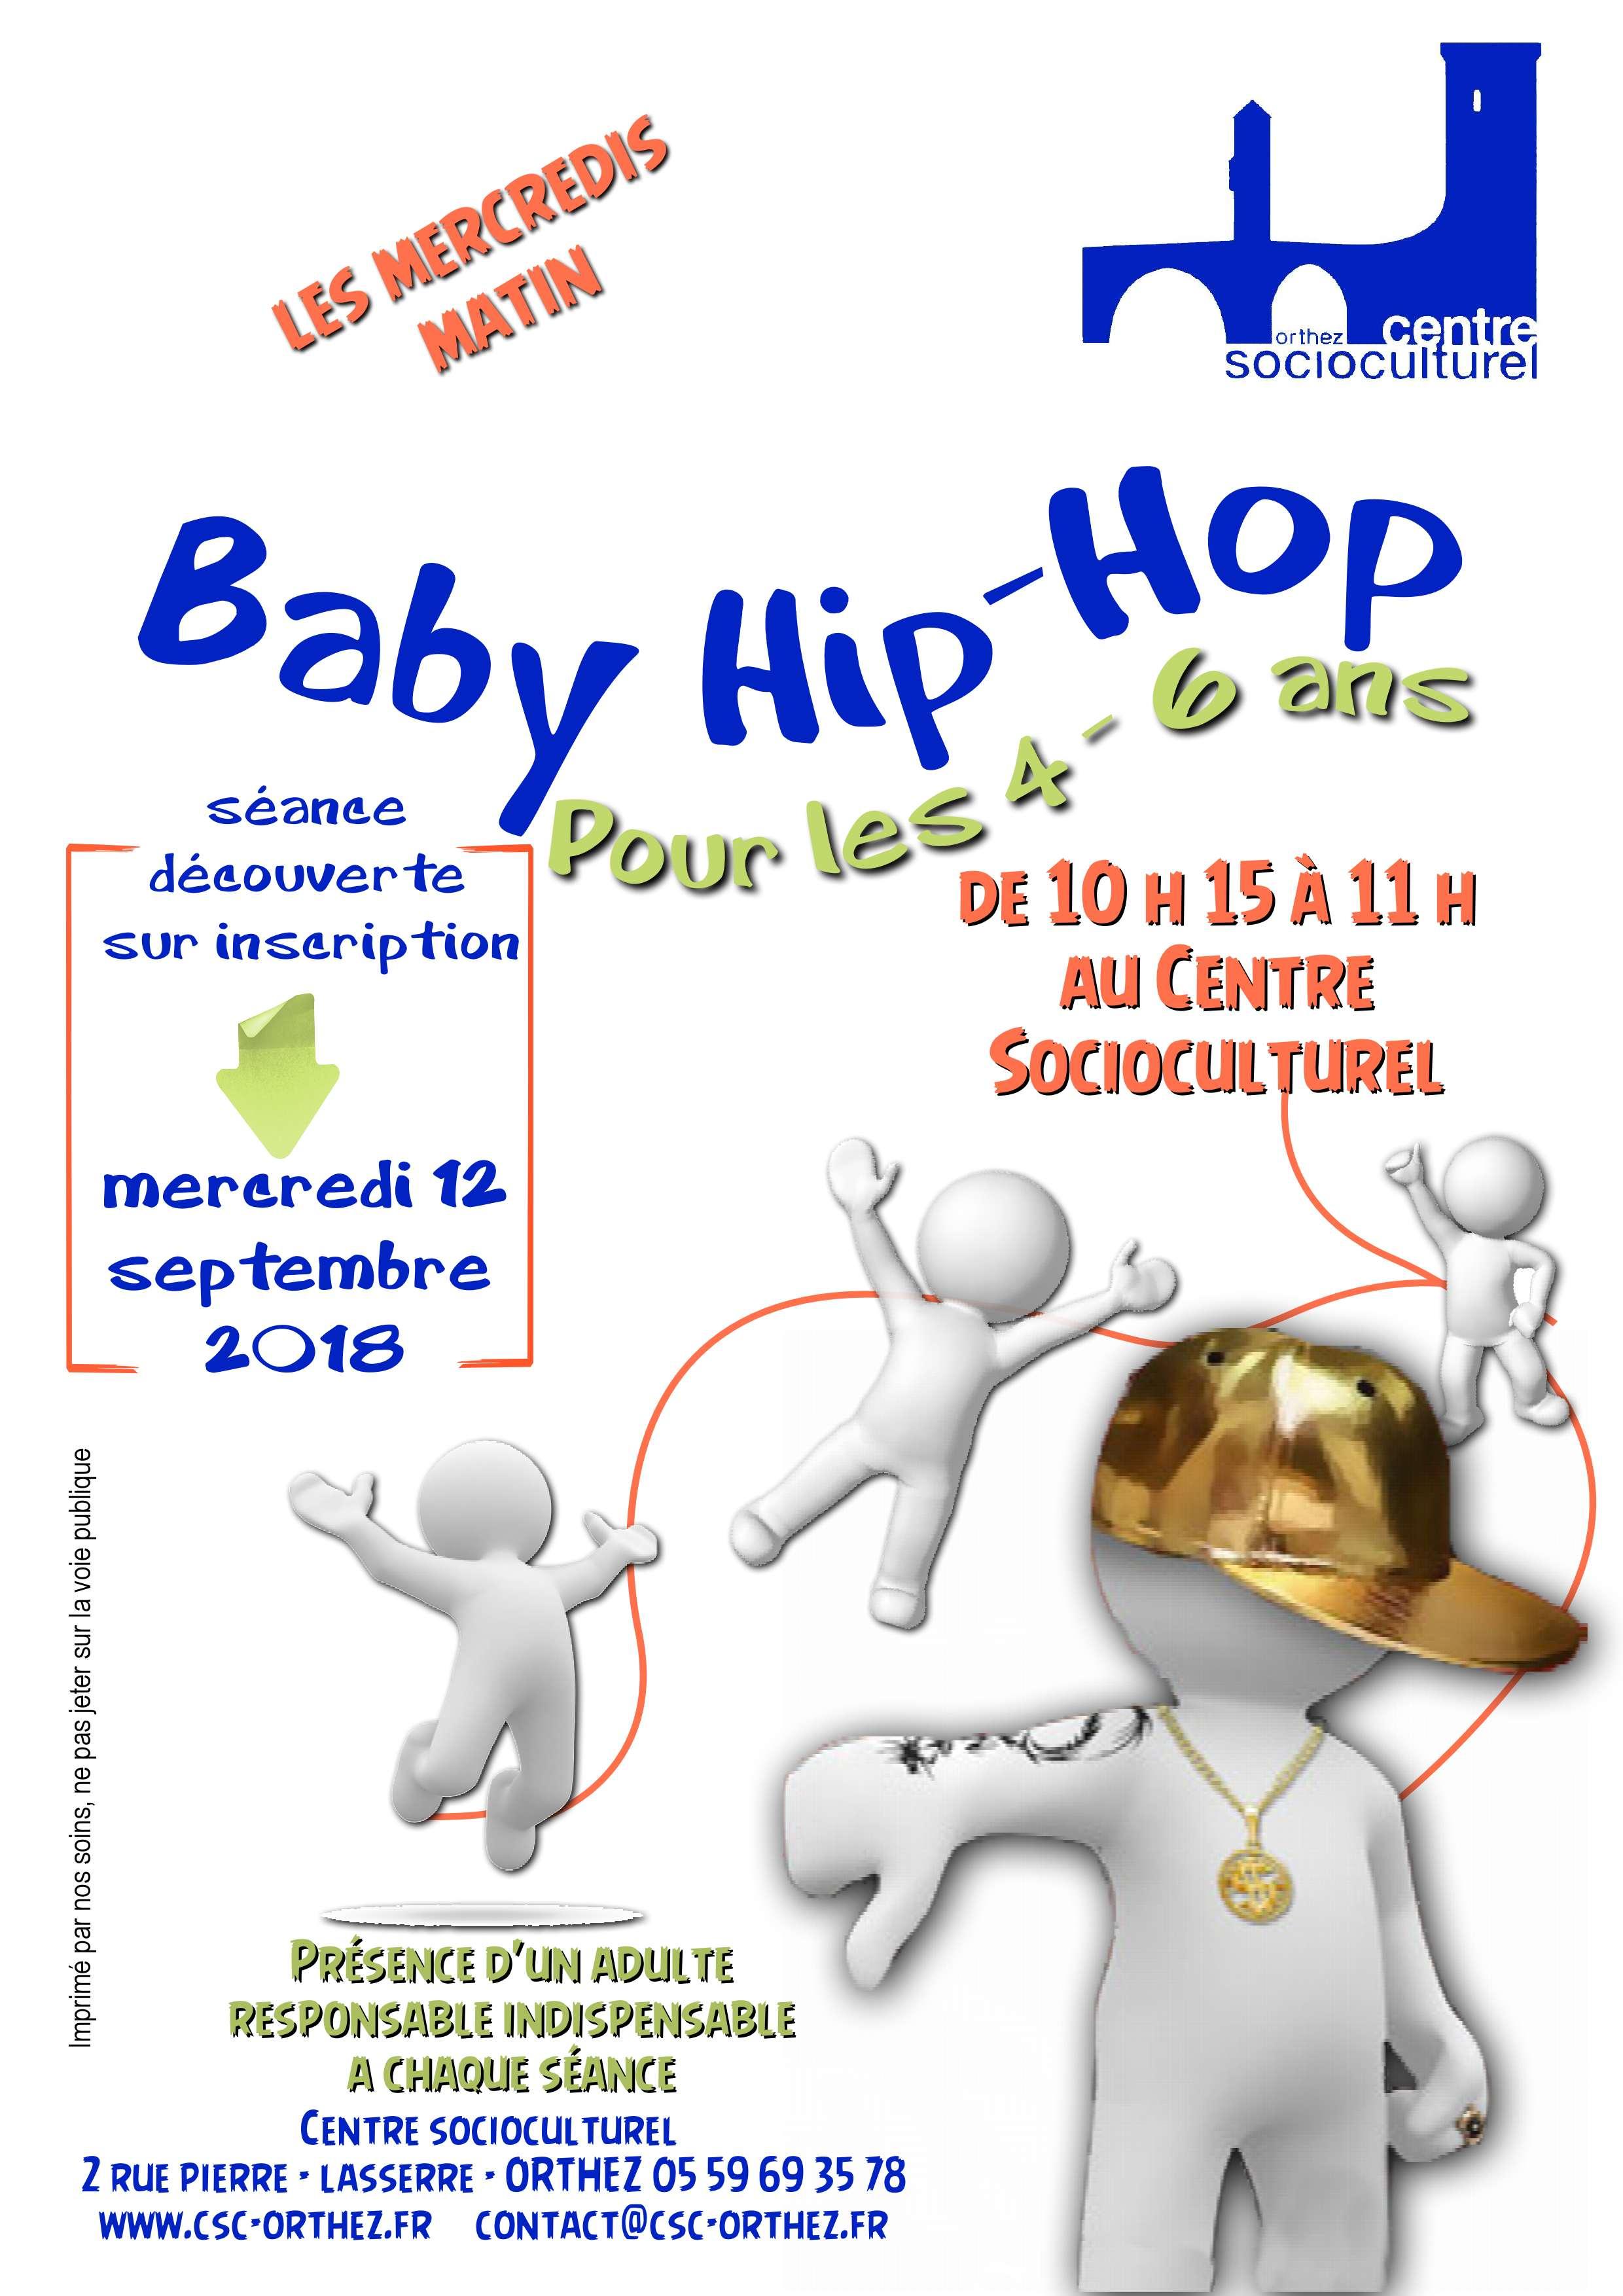 89Baby hip hop